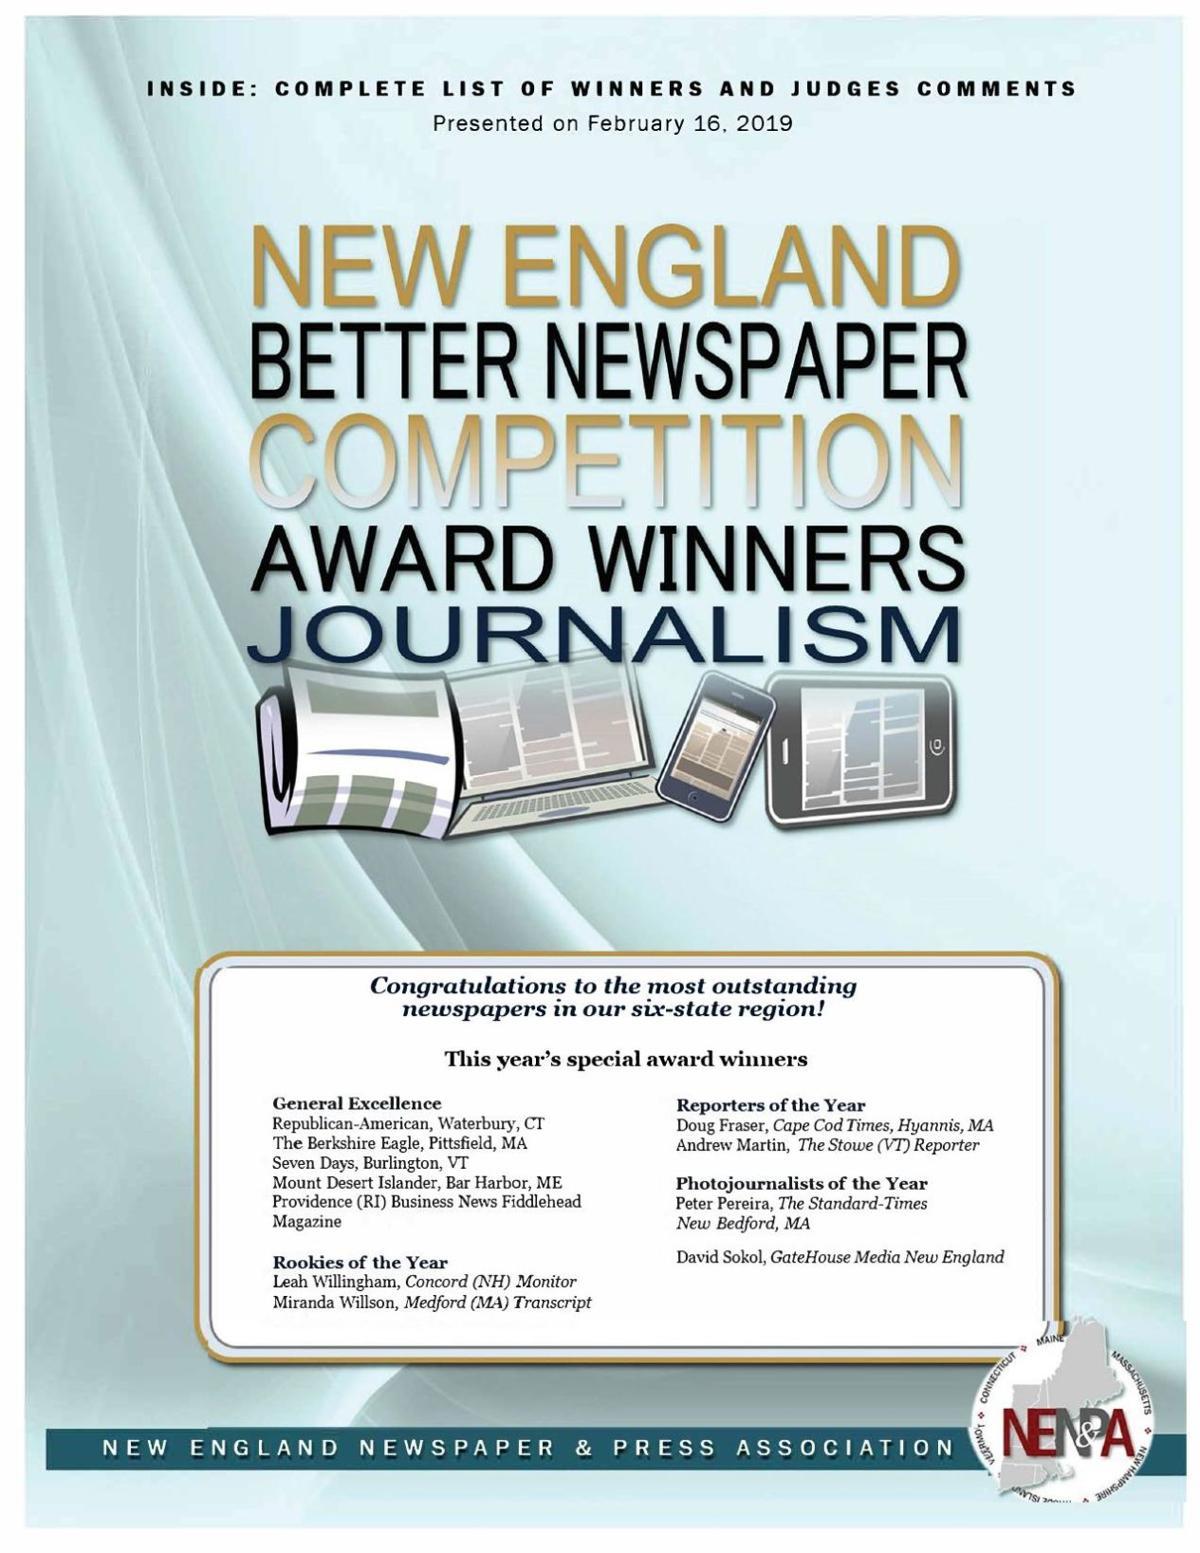 NENPA: 2018 Journalism Award Winners